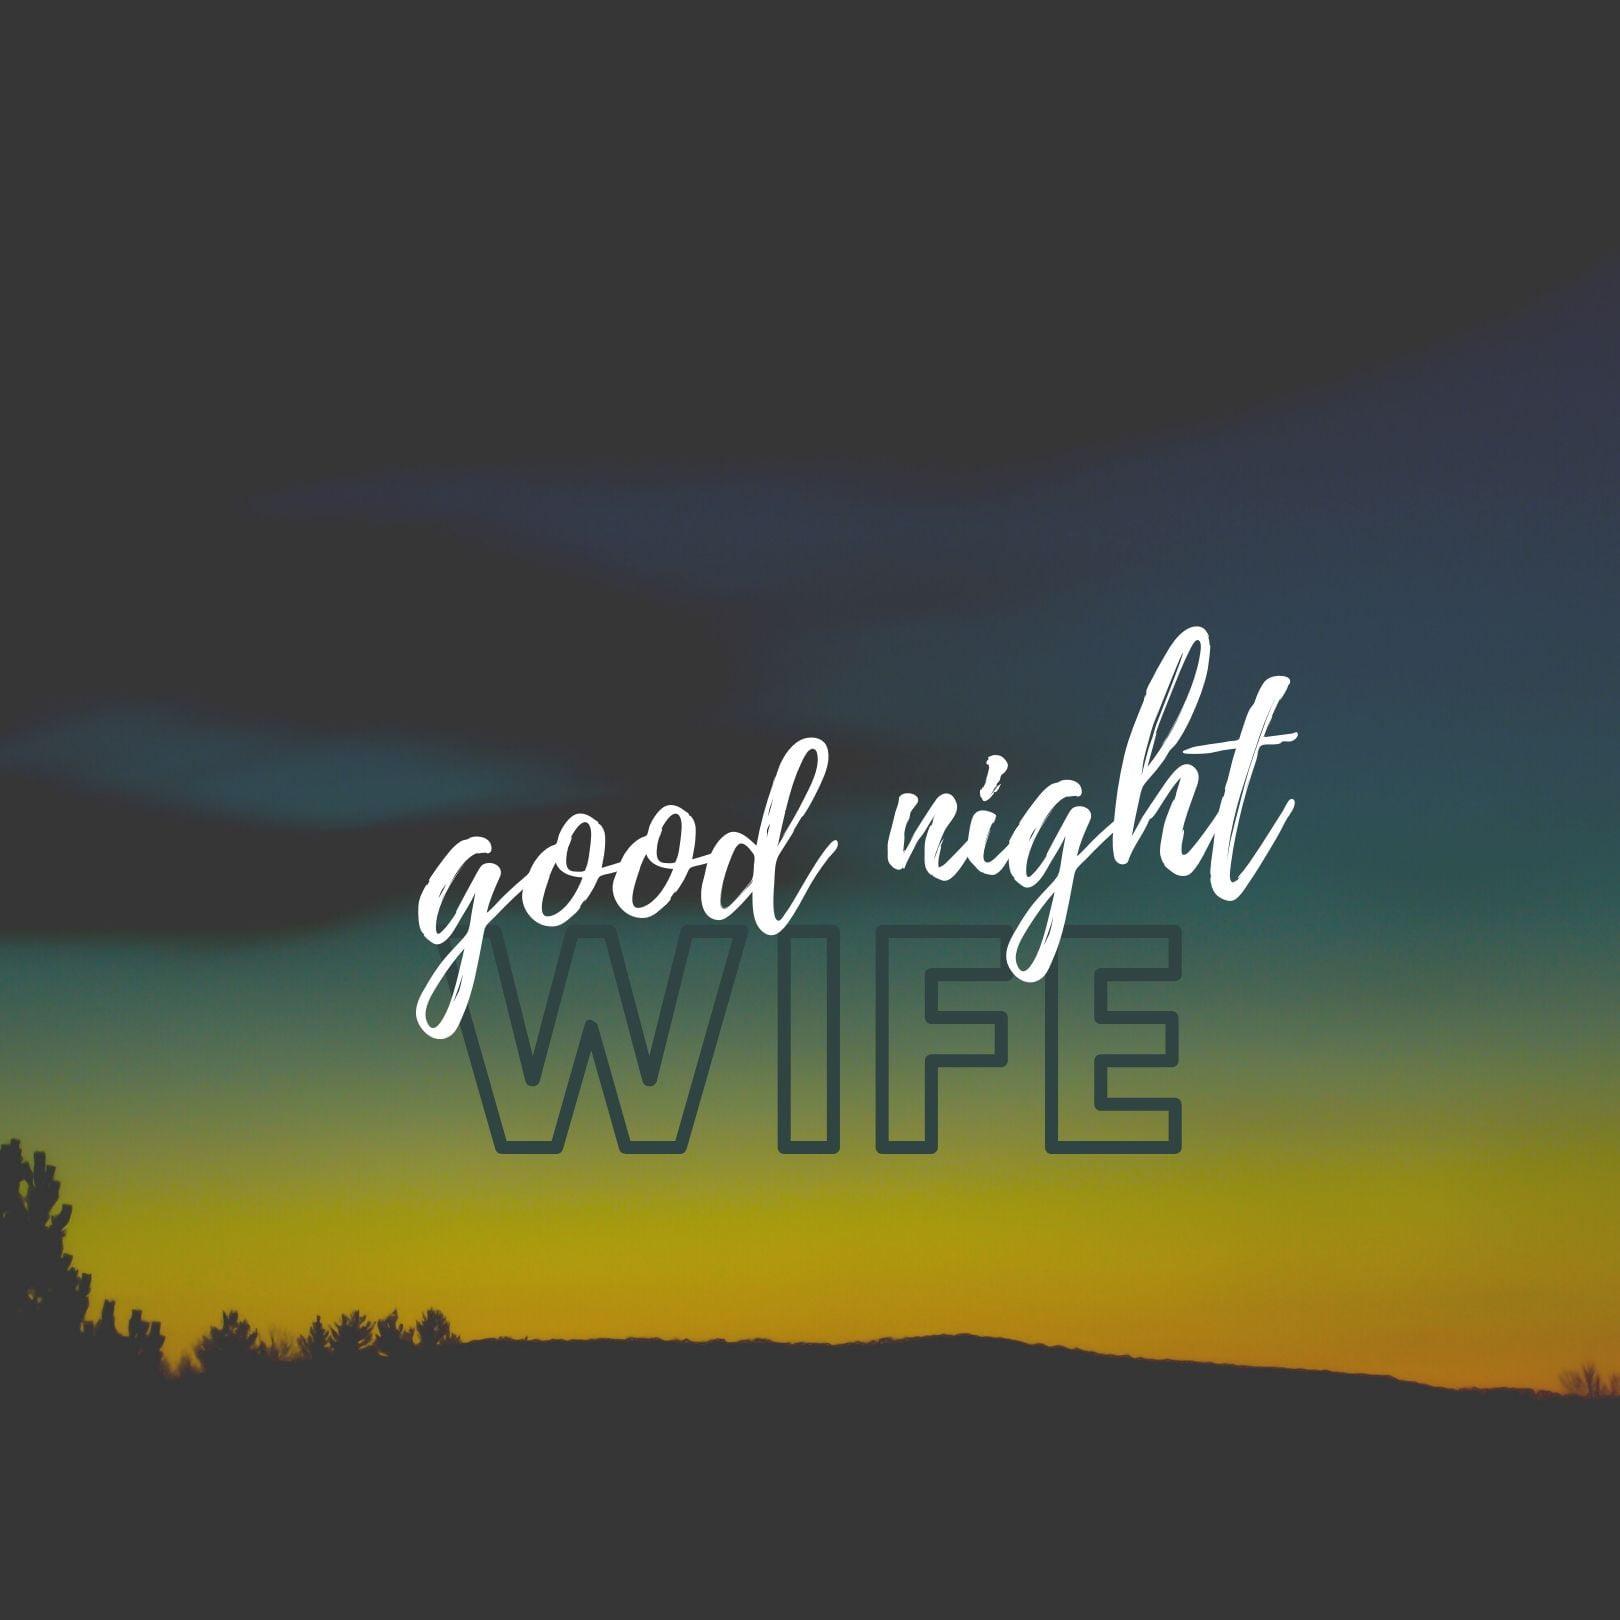 Good Night Wife Pic full HD free download.